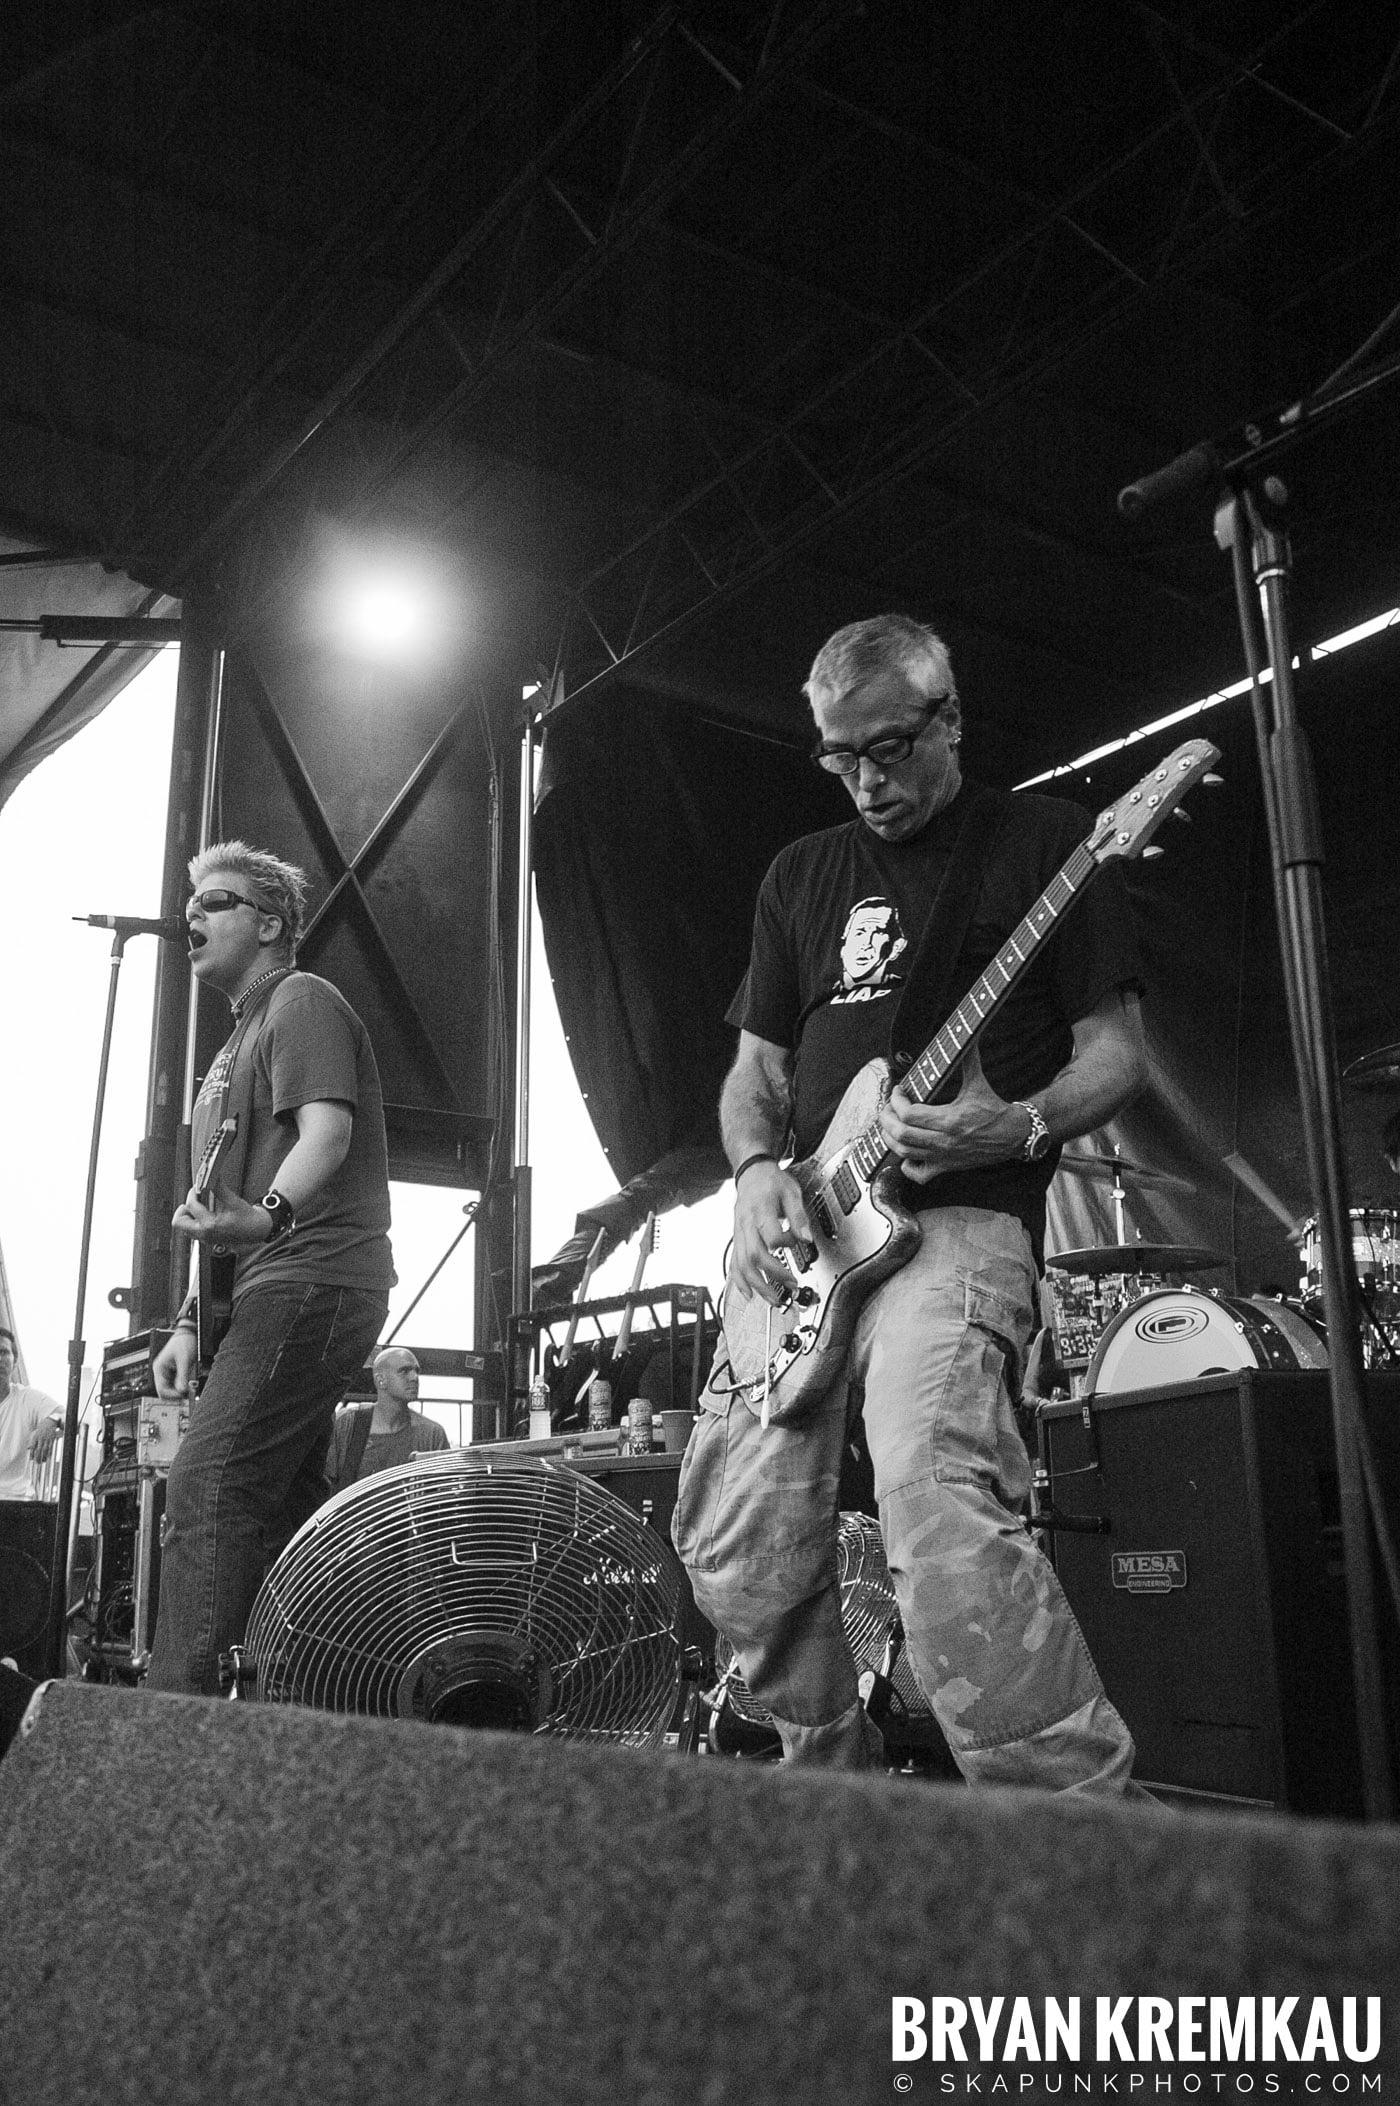 The Offspring @ Warped Tour 05, NYC - 8.12.05 (1)